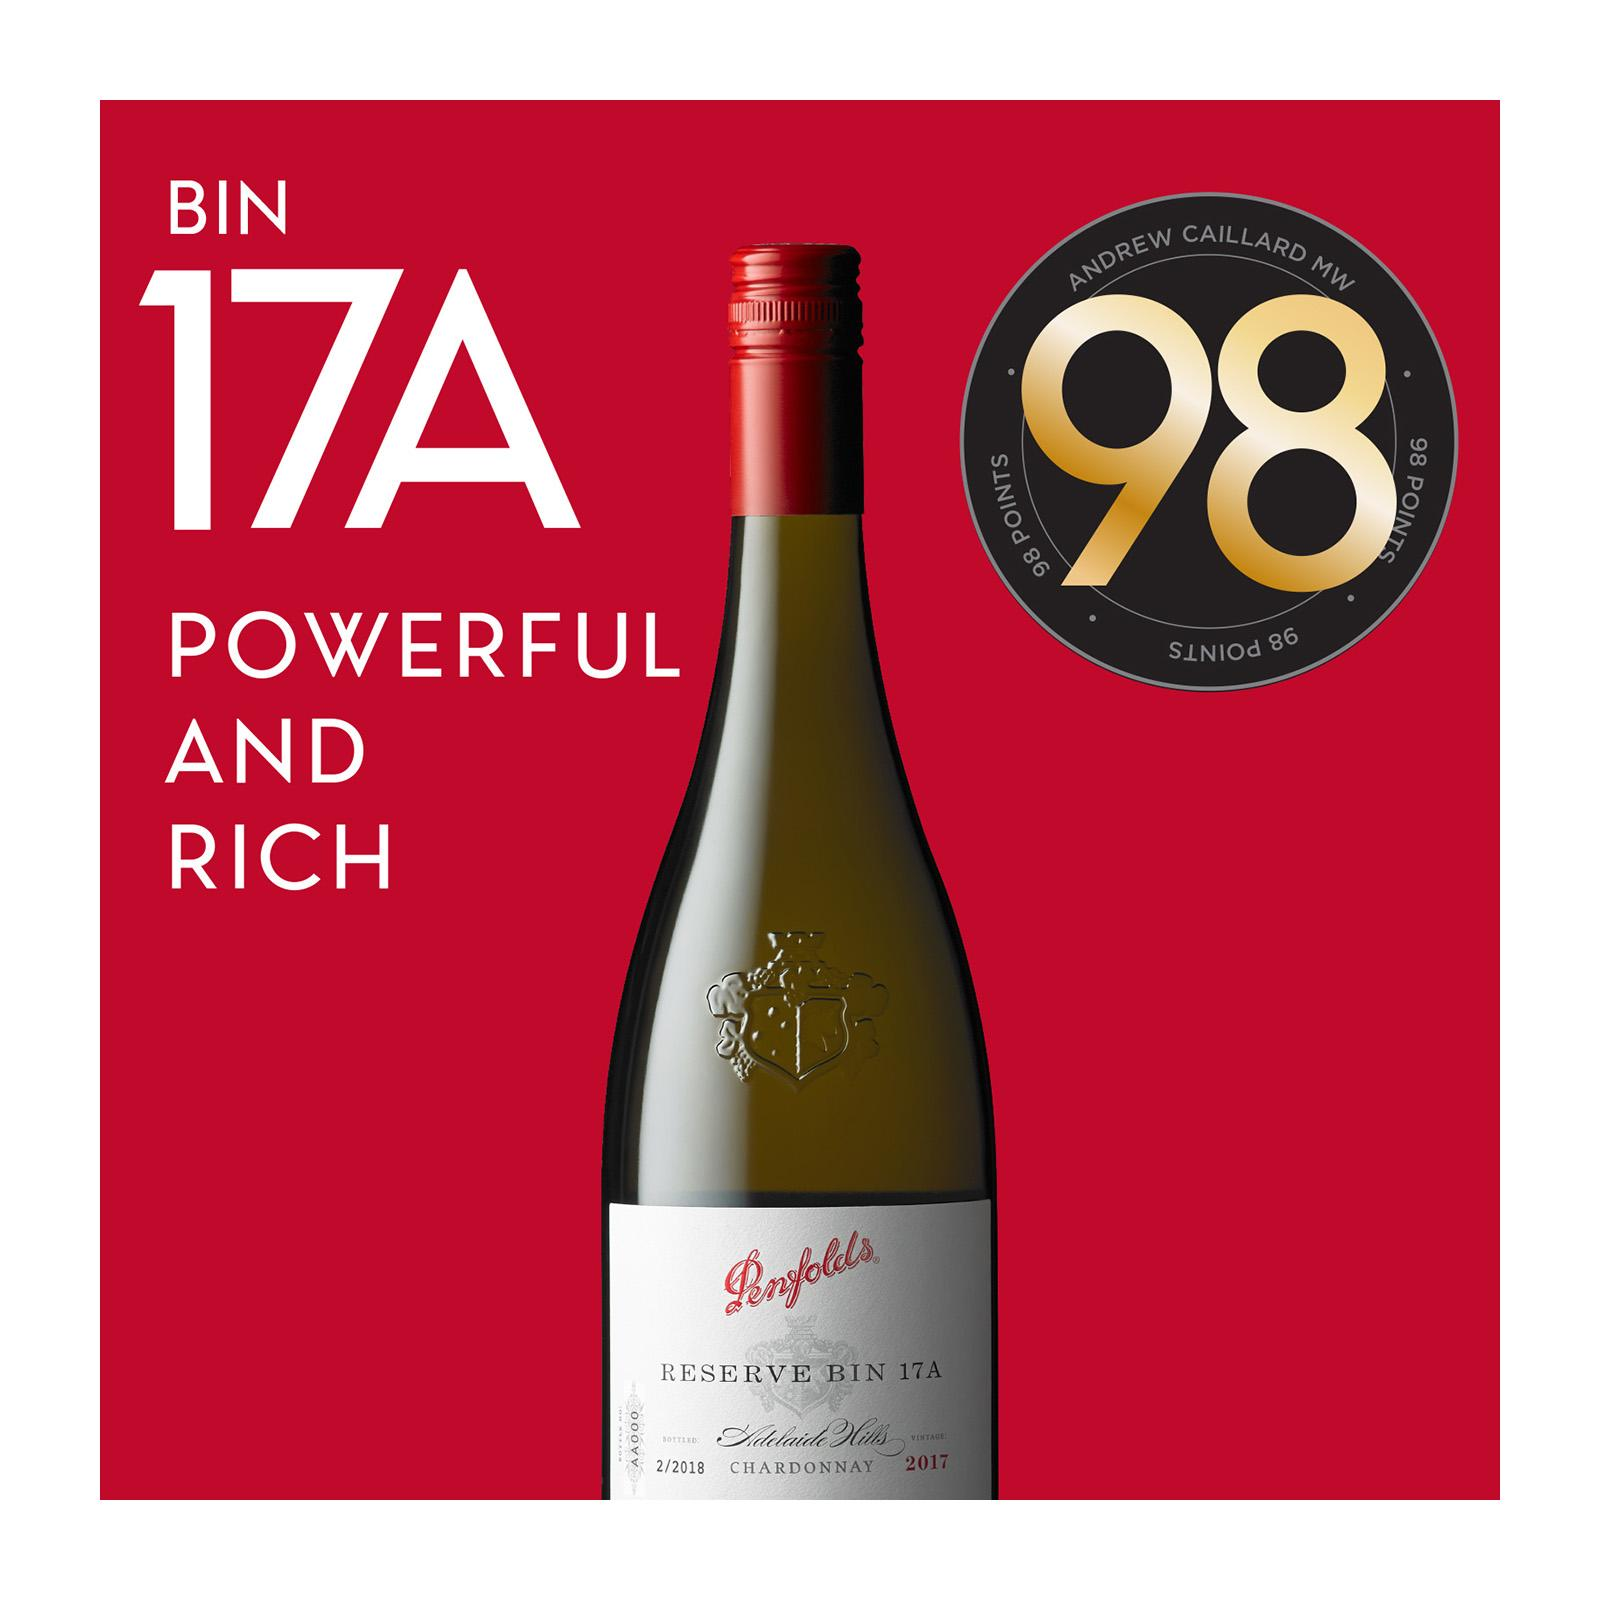 Penfolds Reserve Bin 17A Chardonnay 2017 Wine Bottle